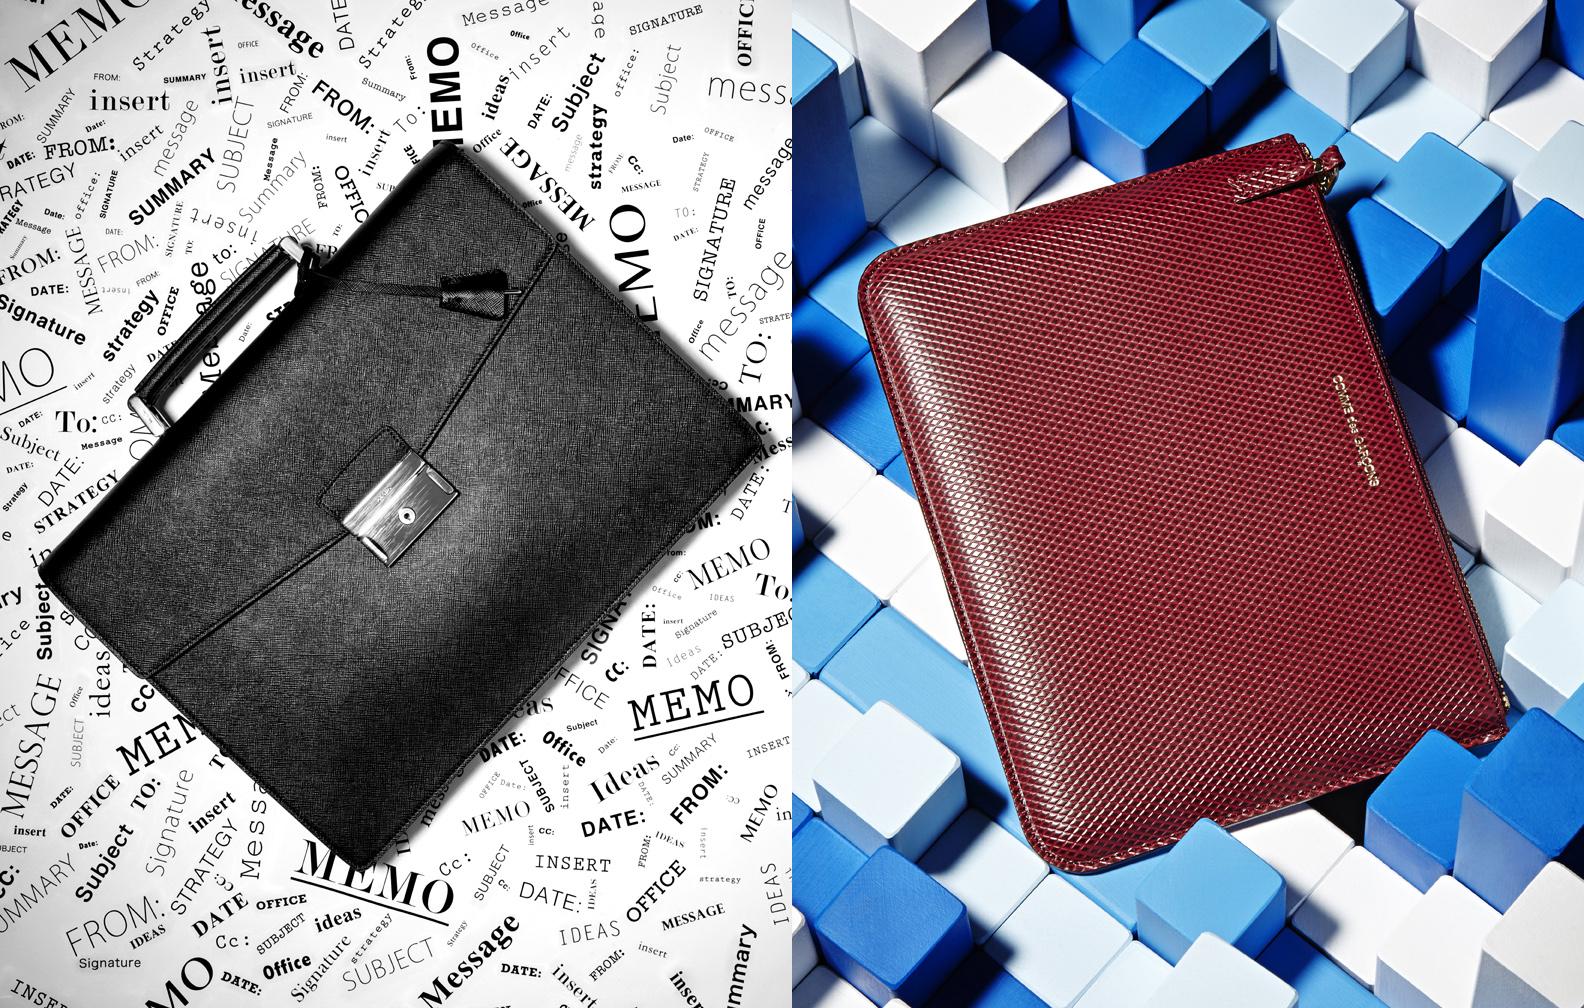 Aurelie Graillot_MEN'S BUSINESS ACCESSORIES_Prada Briefcase_Comme des Garcon_p03&04.jpg